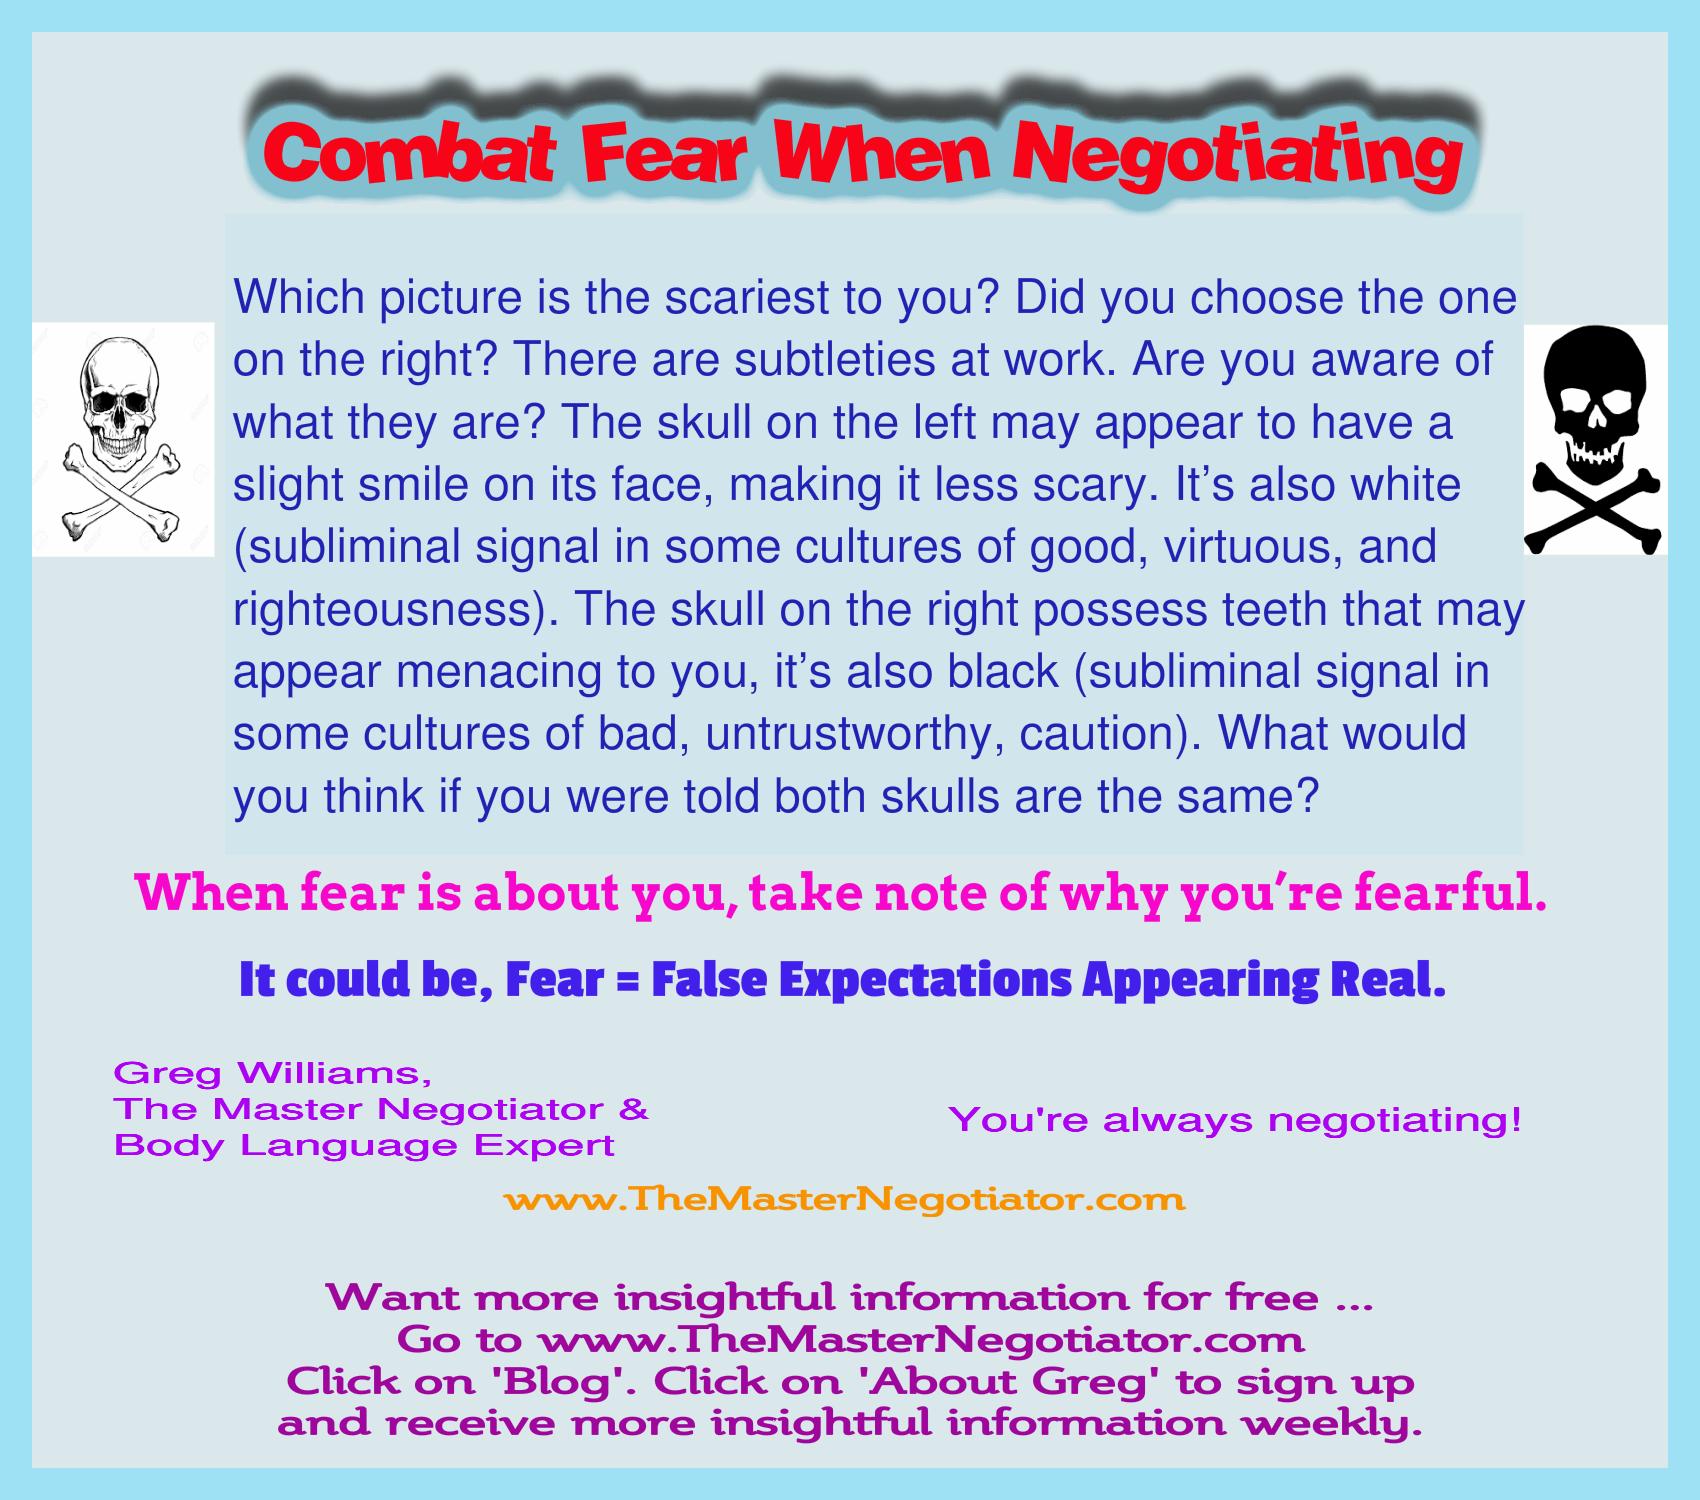 Combat Fear When Negotiating